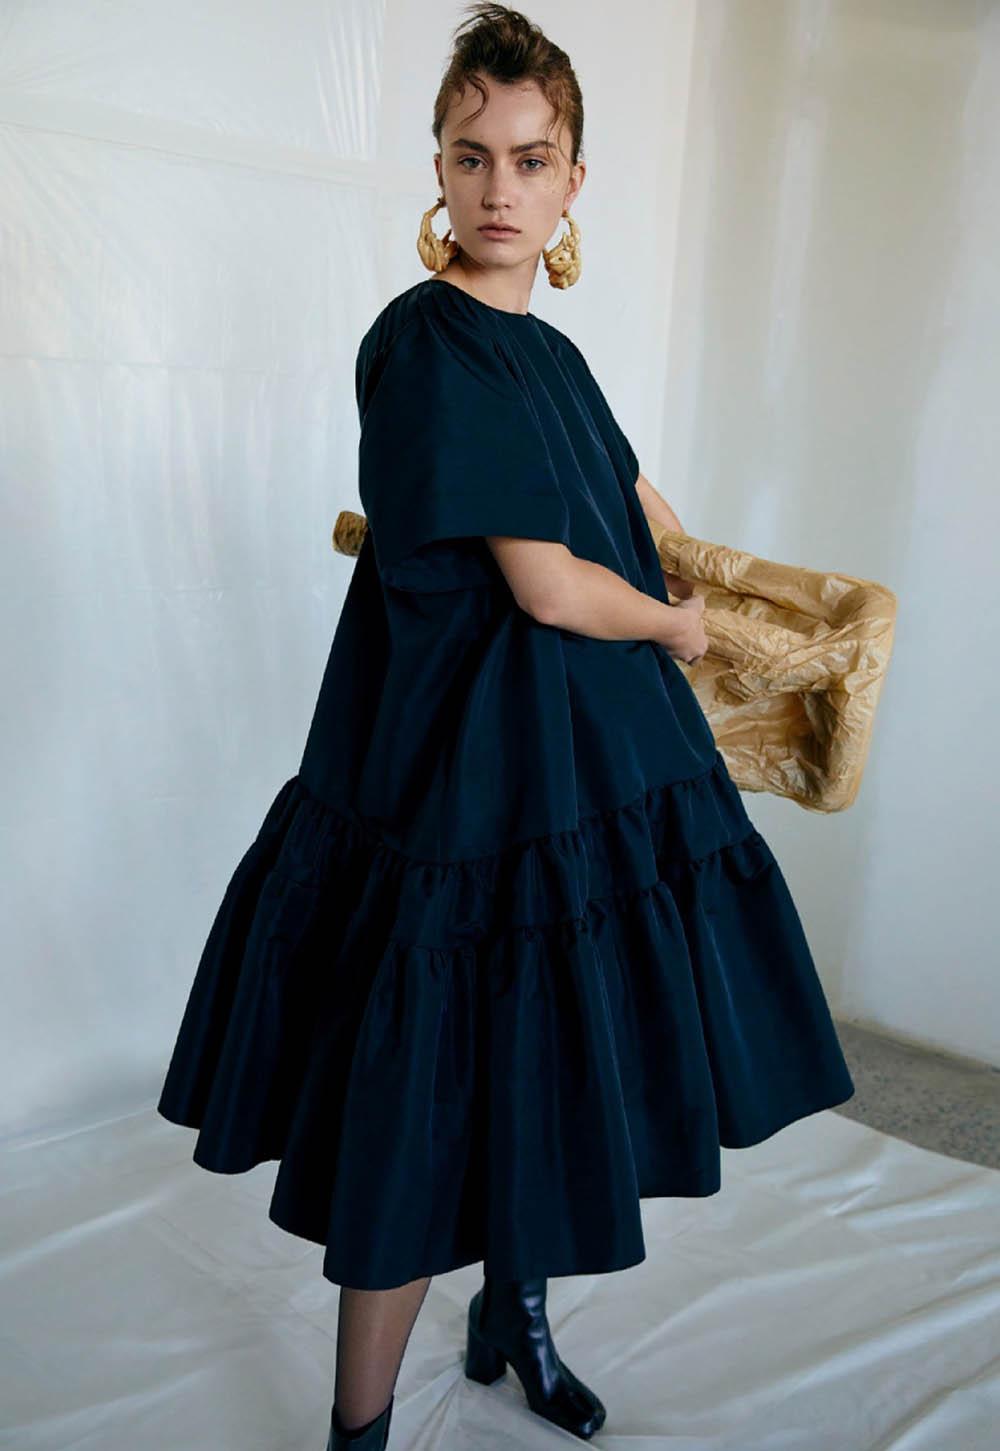 Rose Valentine by Royal Gilbert for Elle Canada December 2019Rose Valentine by Royal Gilbert for Elle Canada December 2019